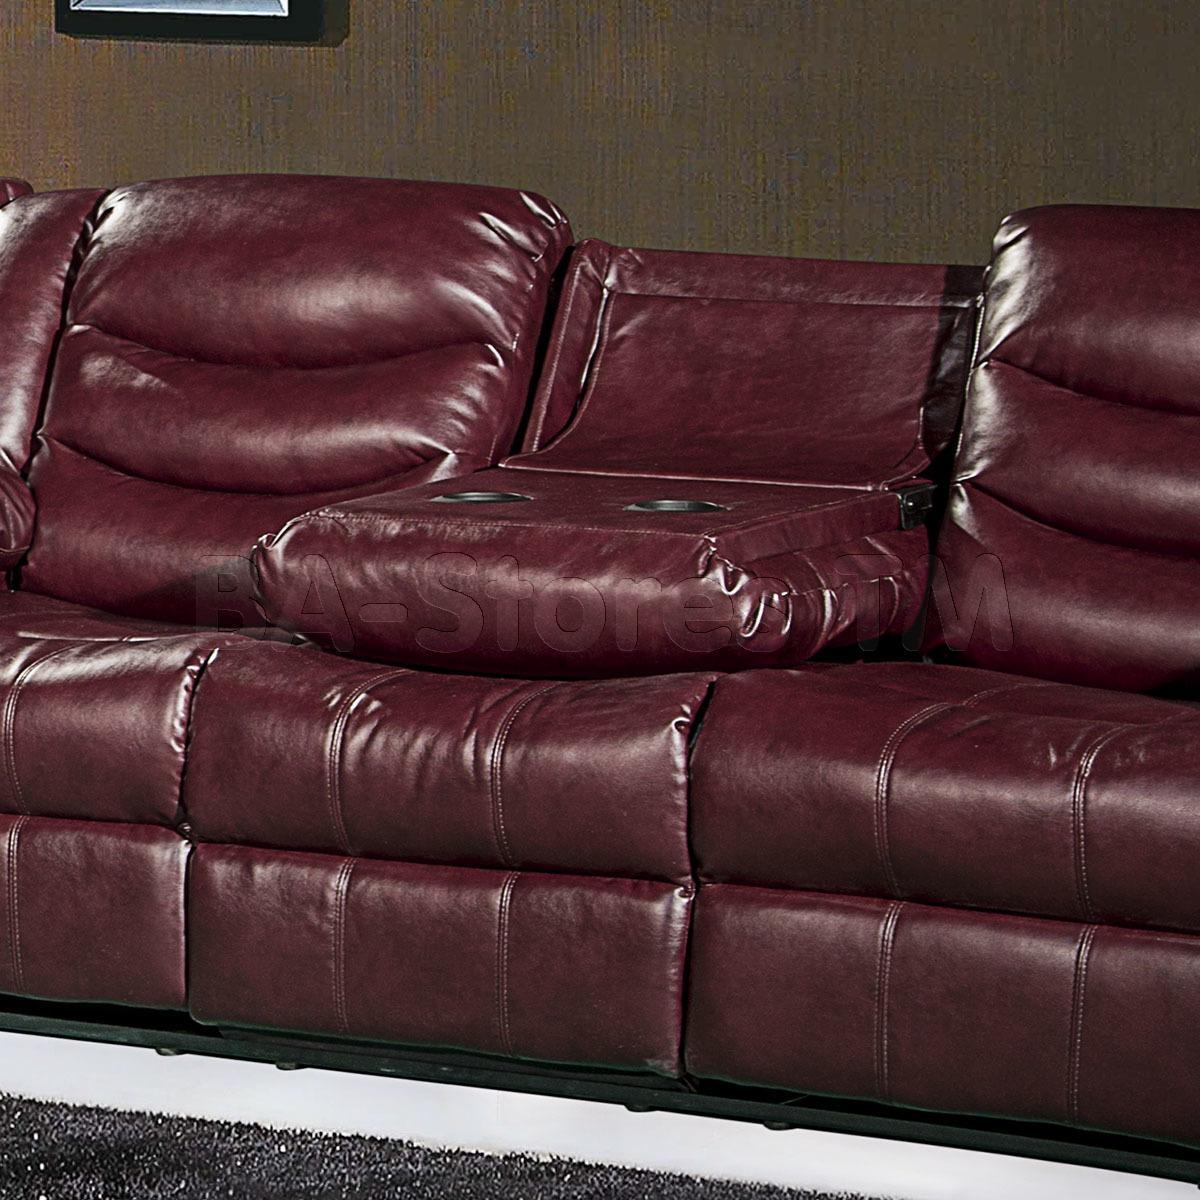 Meridian Furniture 644 Sectional Sofa | Burgundy | Sectional Sofas Within Burgundy Sectional Sofas (Image 15 of 20)